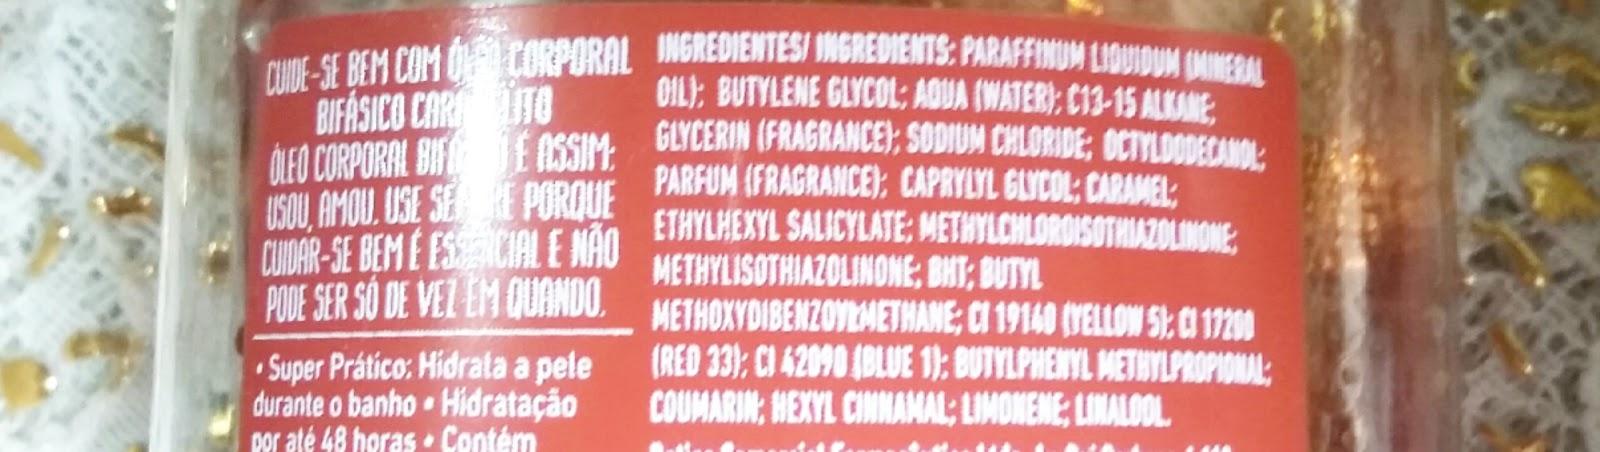 oleo-corporal-bifasico-caramelito-o-boticario